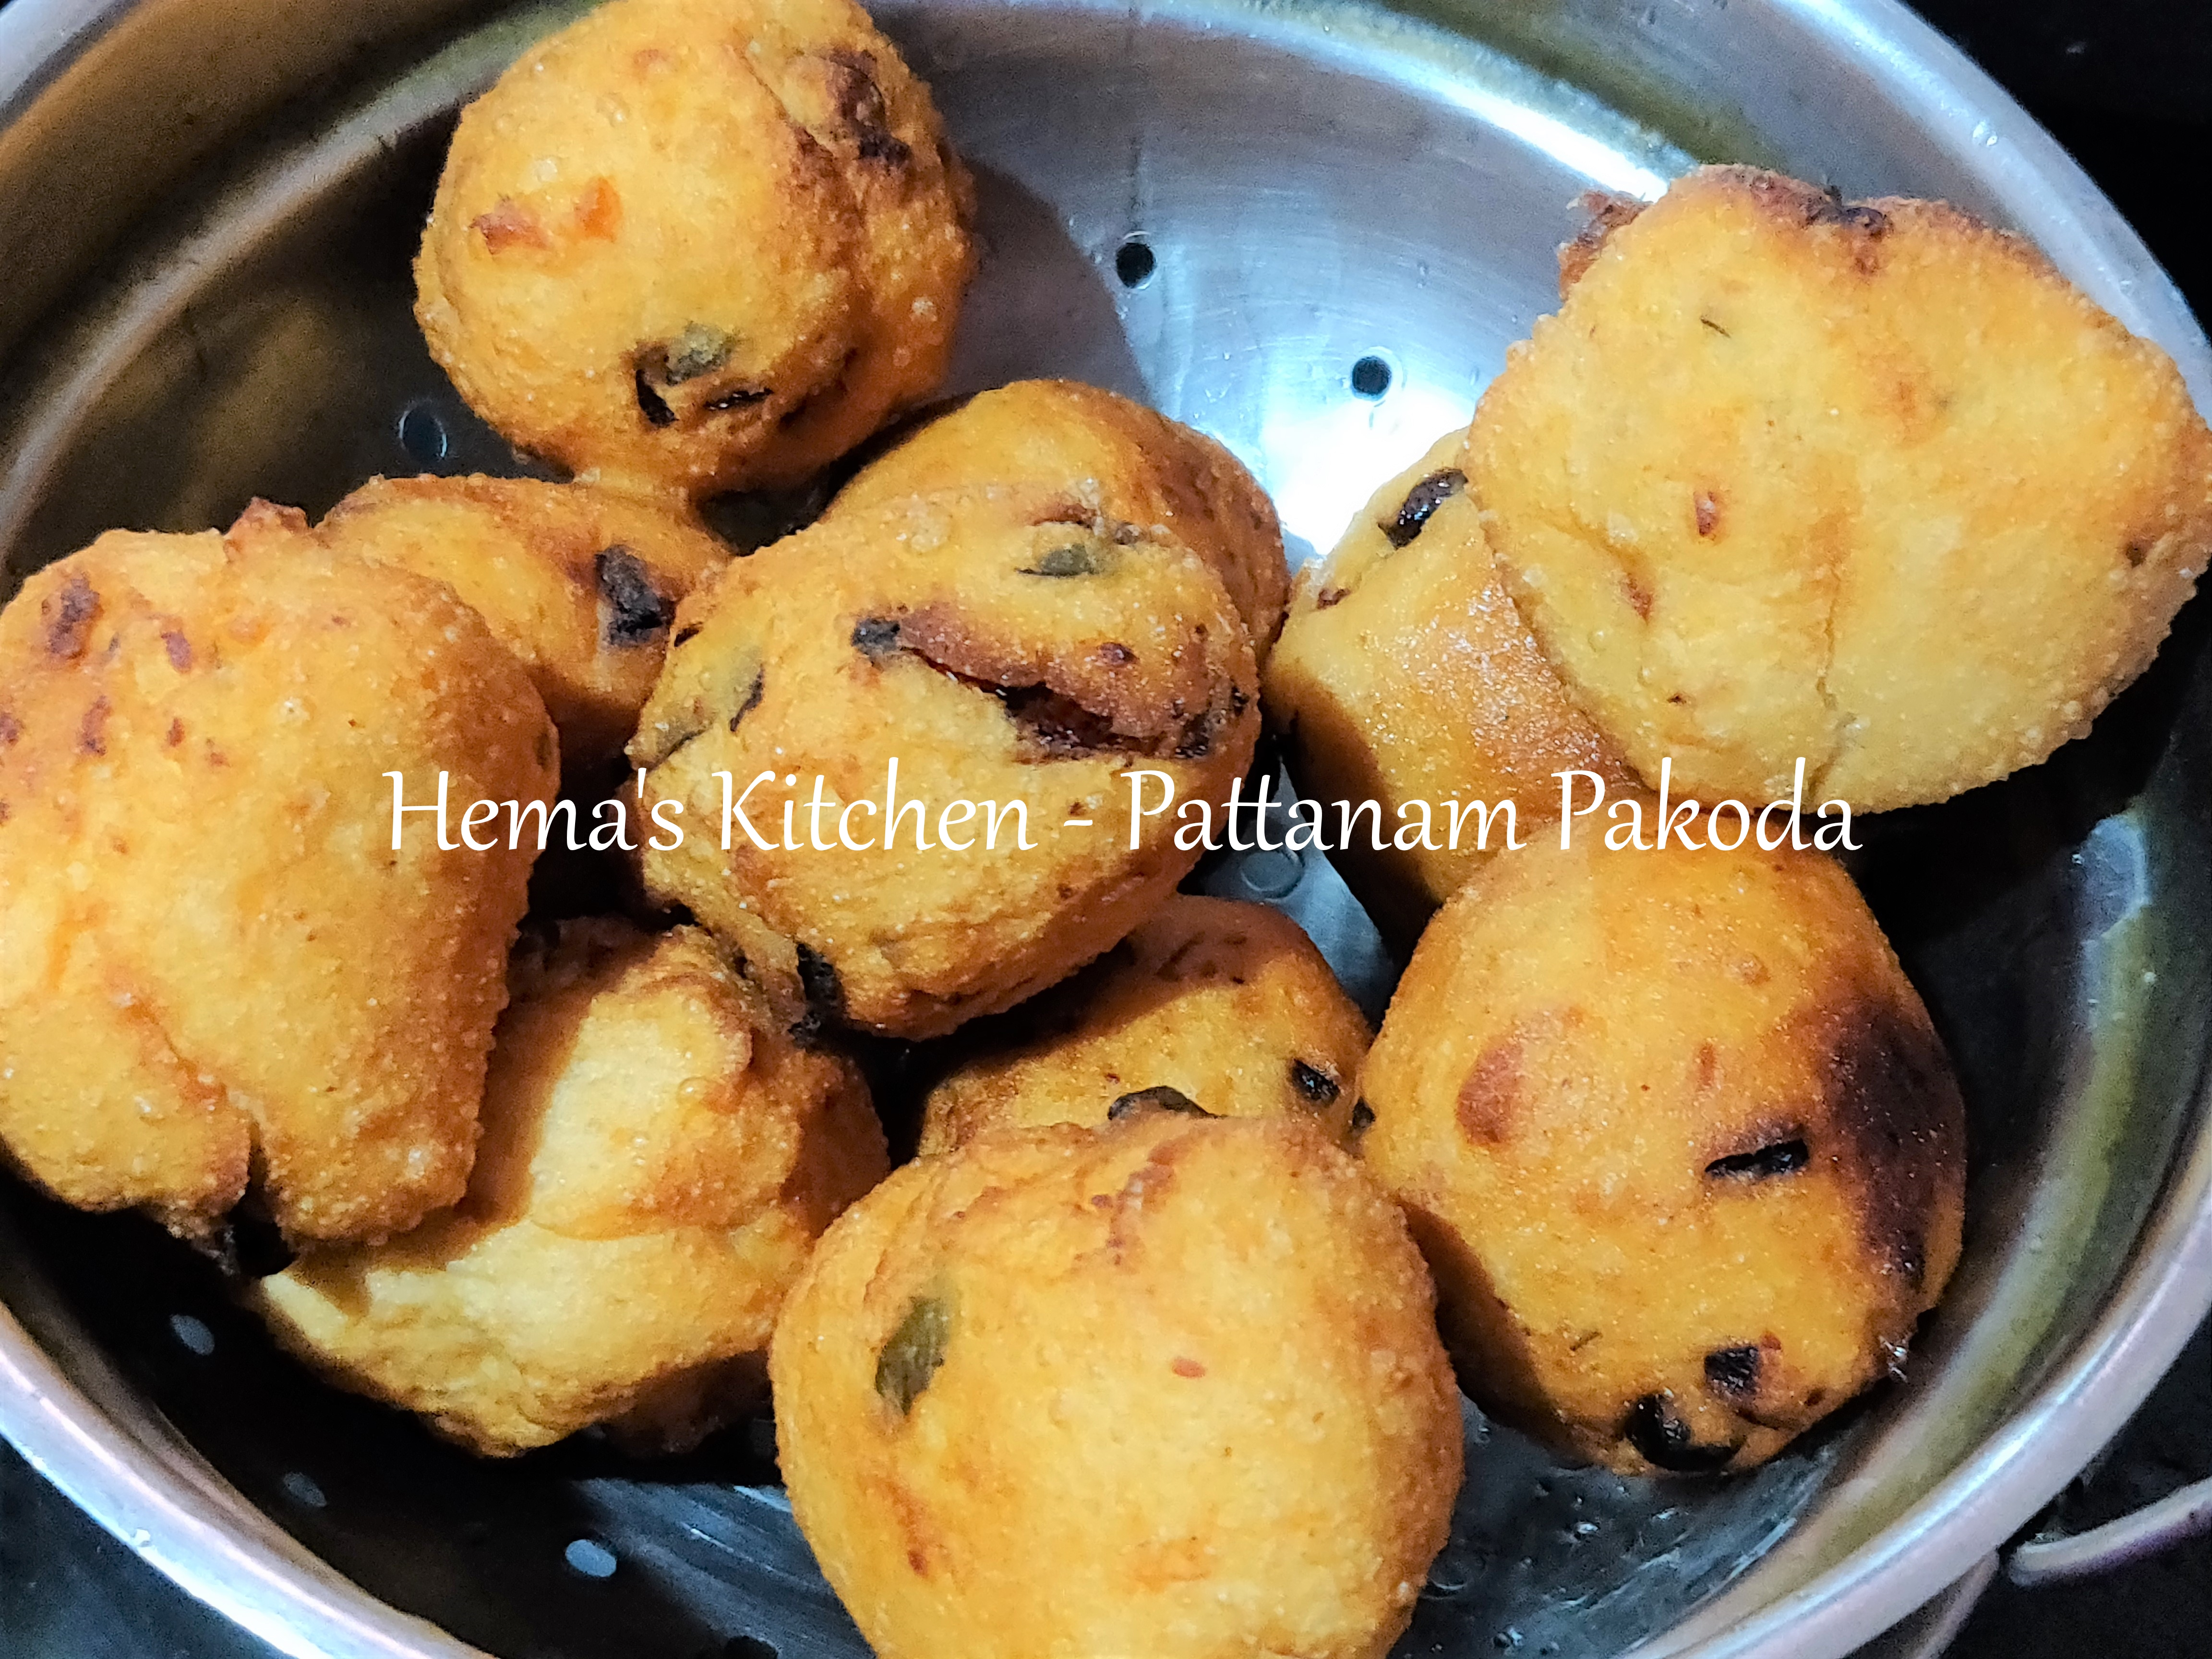 Pattanam Pakoda